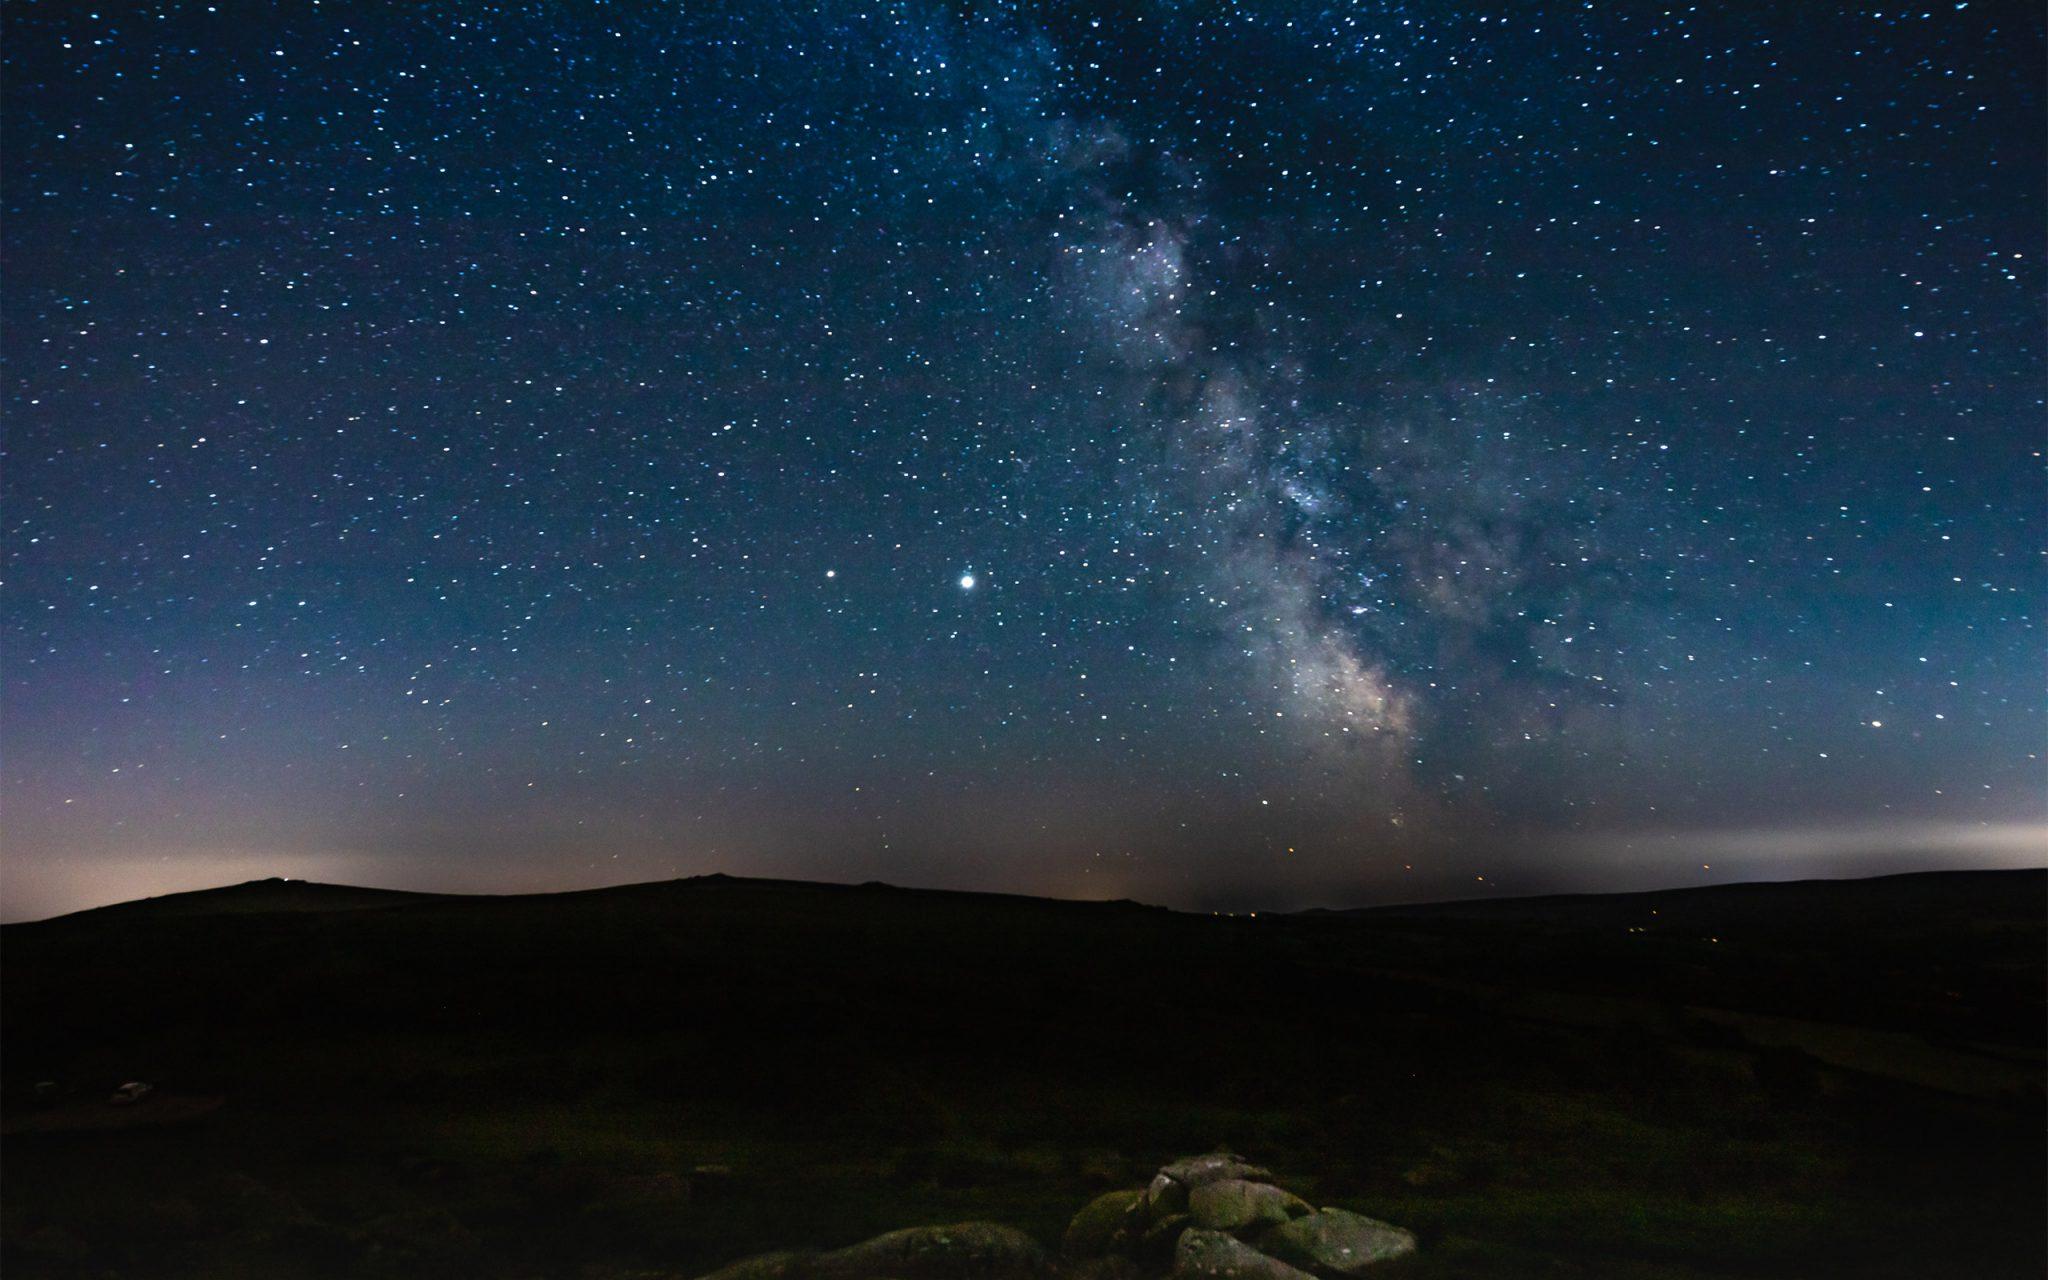 #Saturn & #Jupiter visible within the The Milky Way on #Dartmoor, Devon, UK.